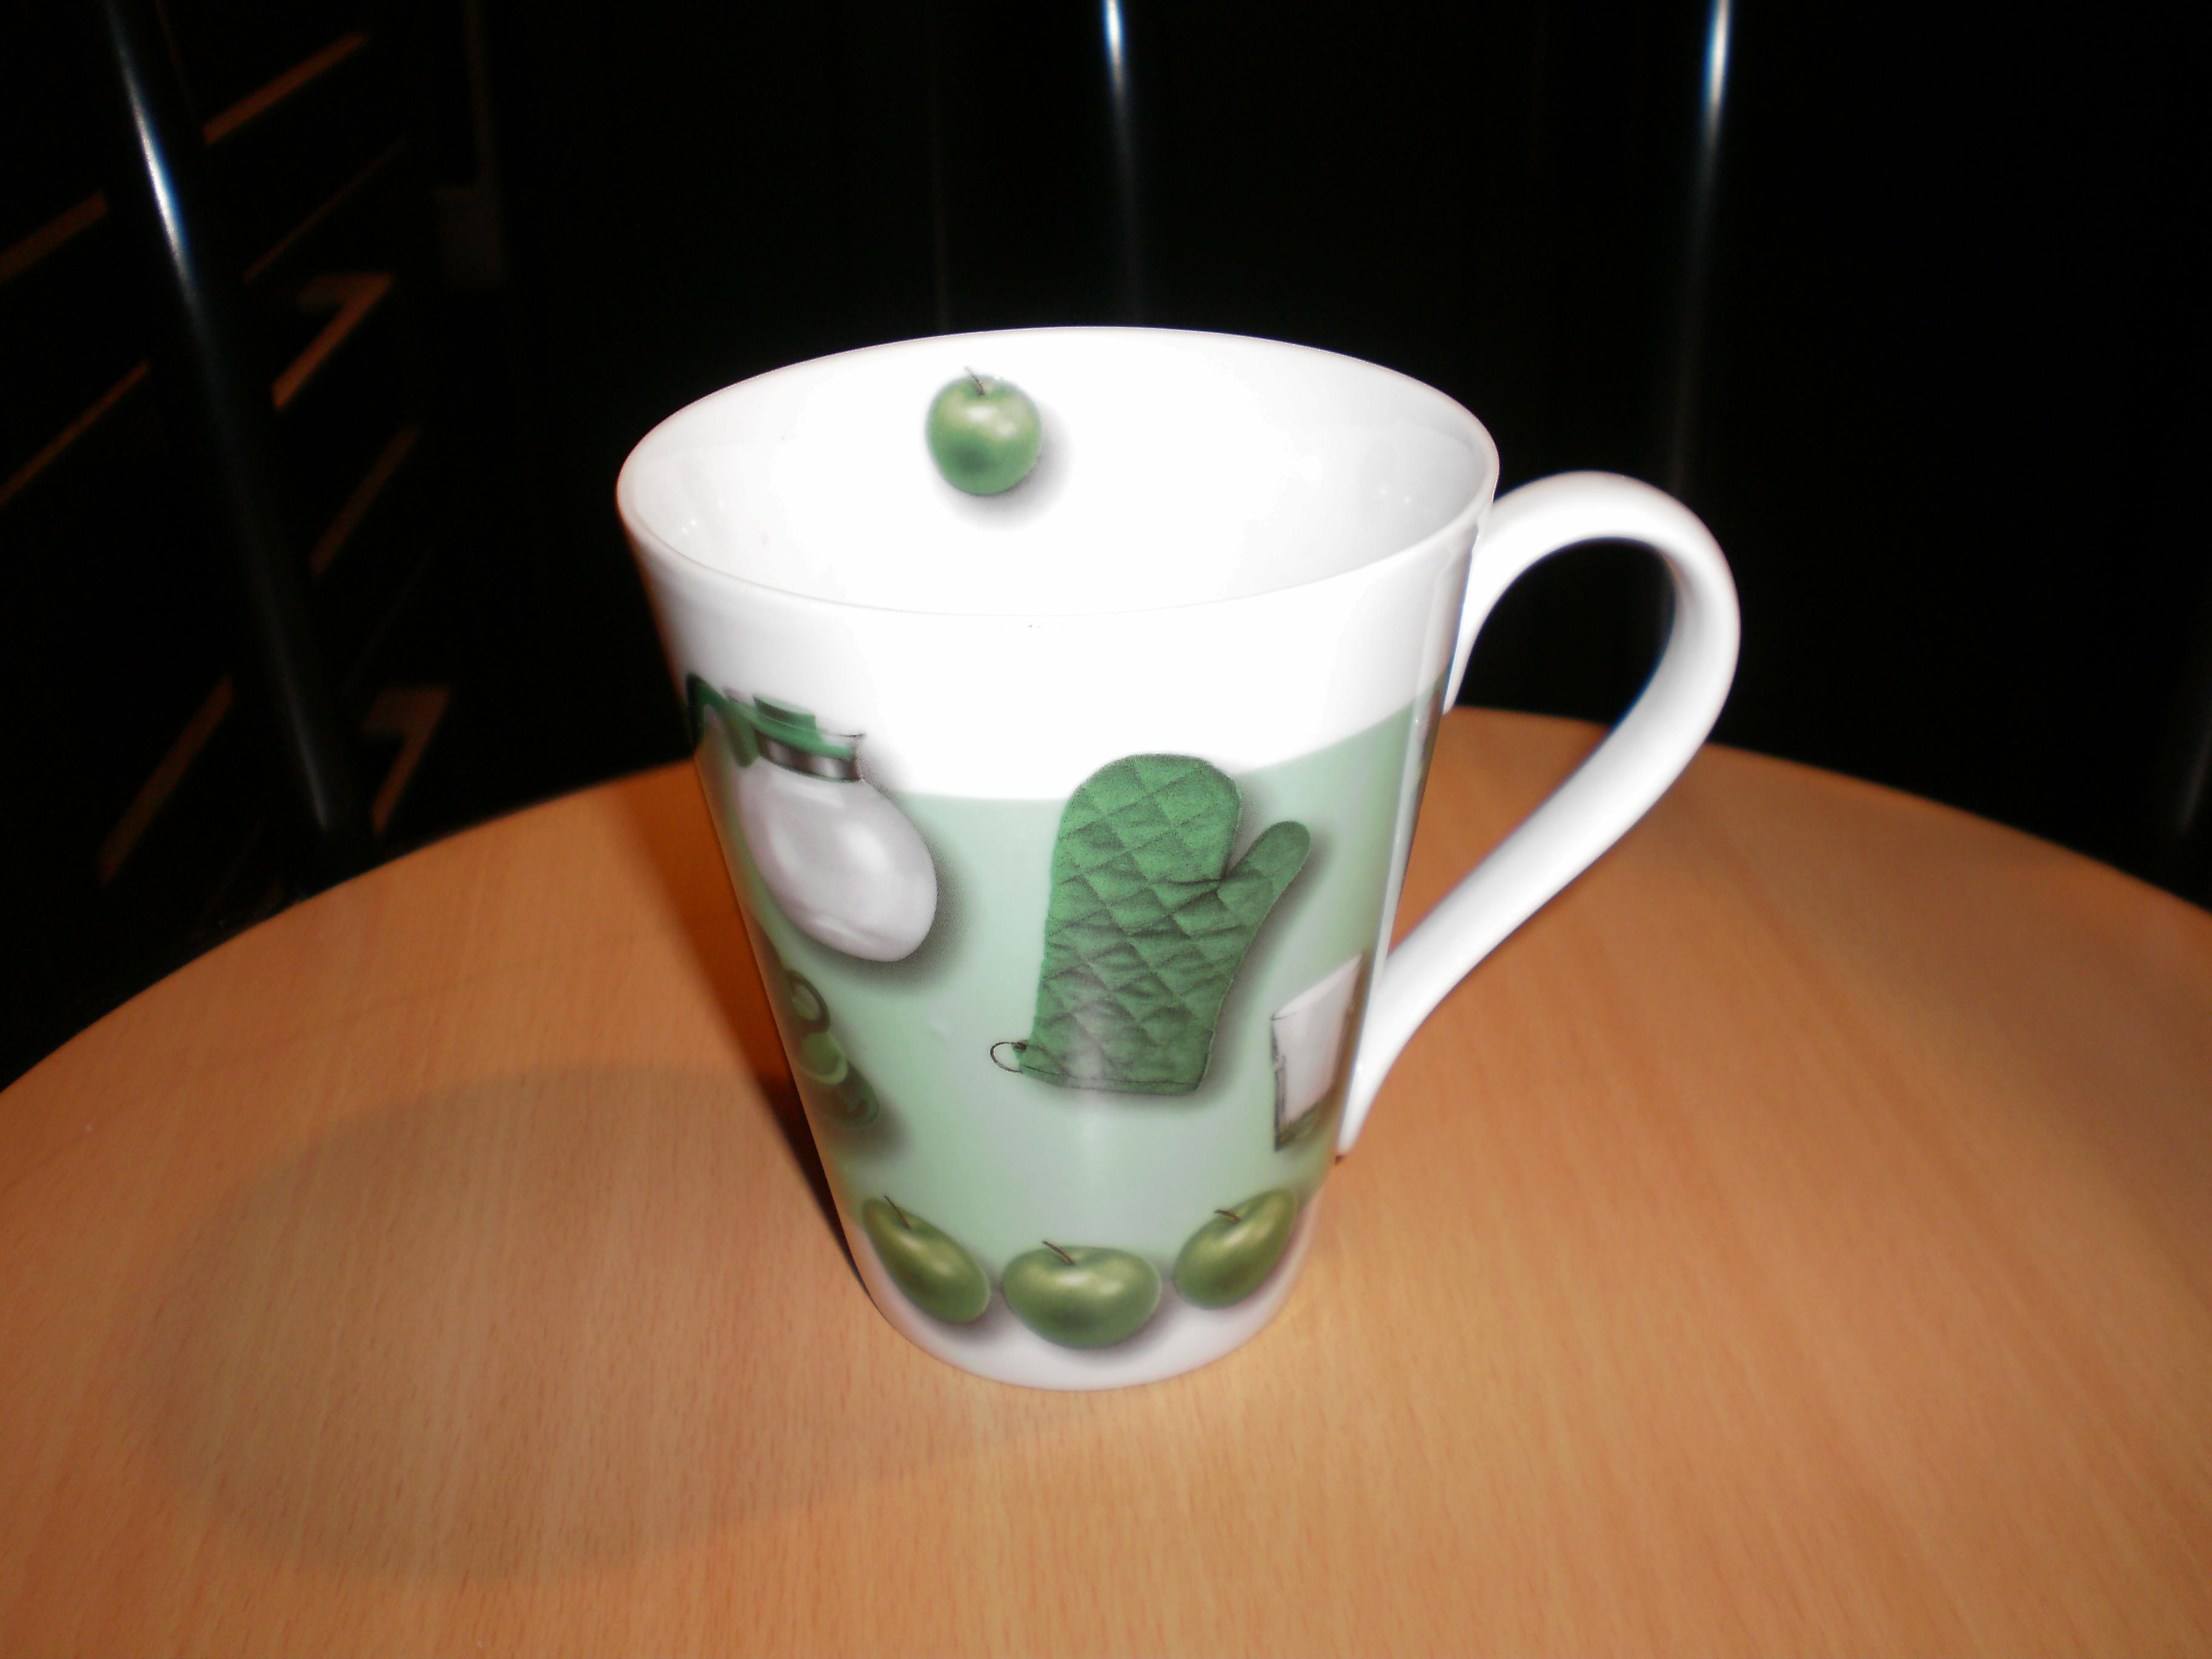 troc de troc mug neuf image 2